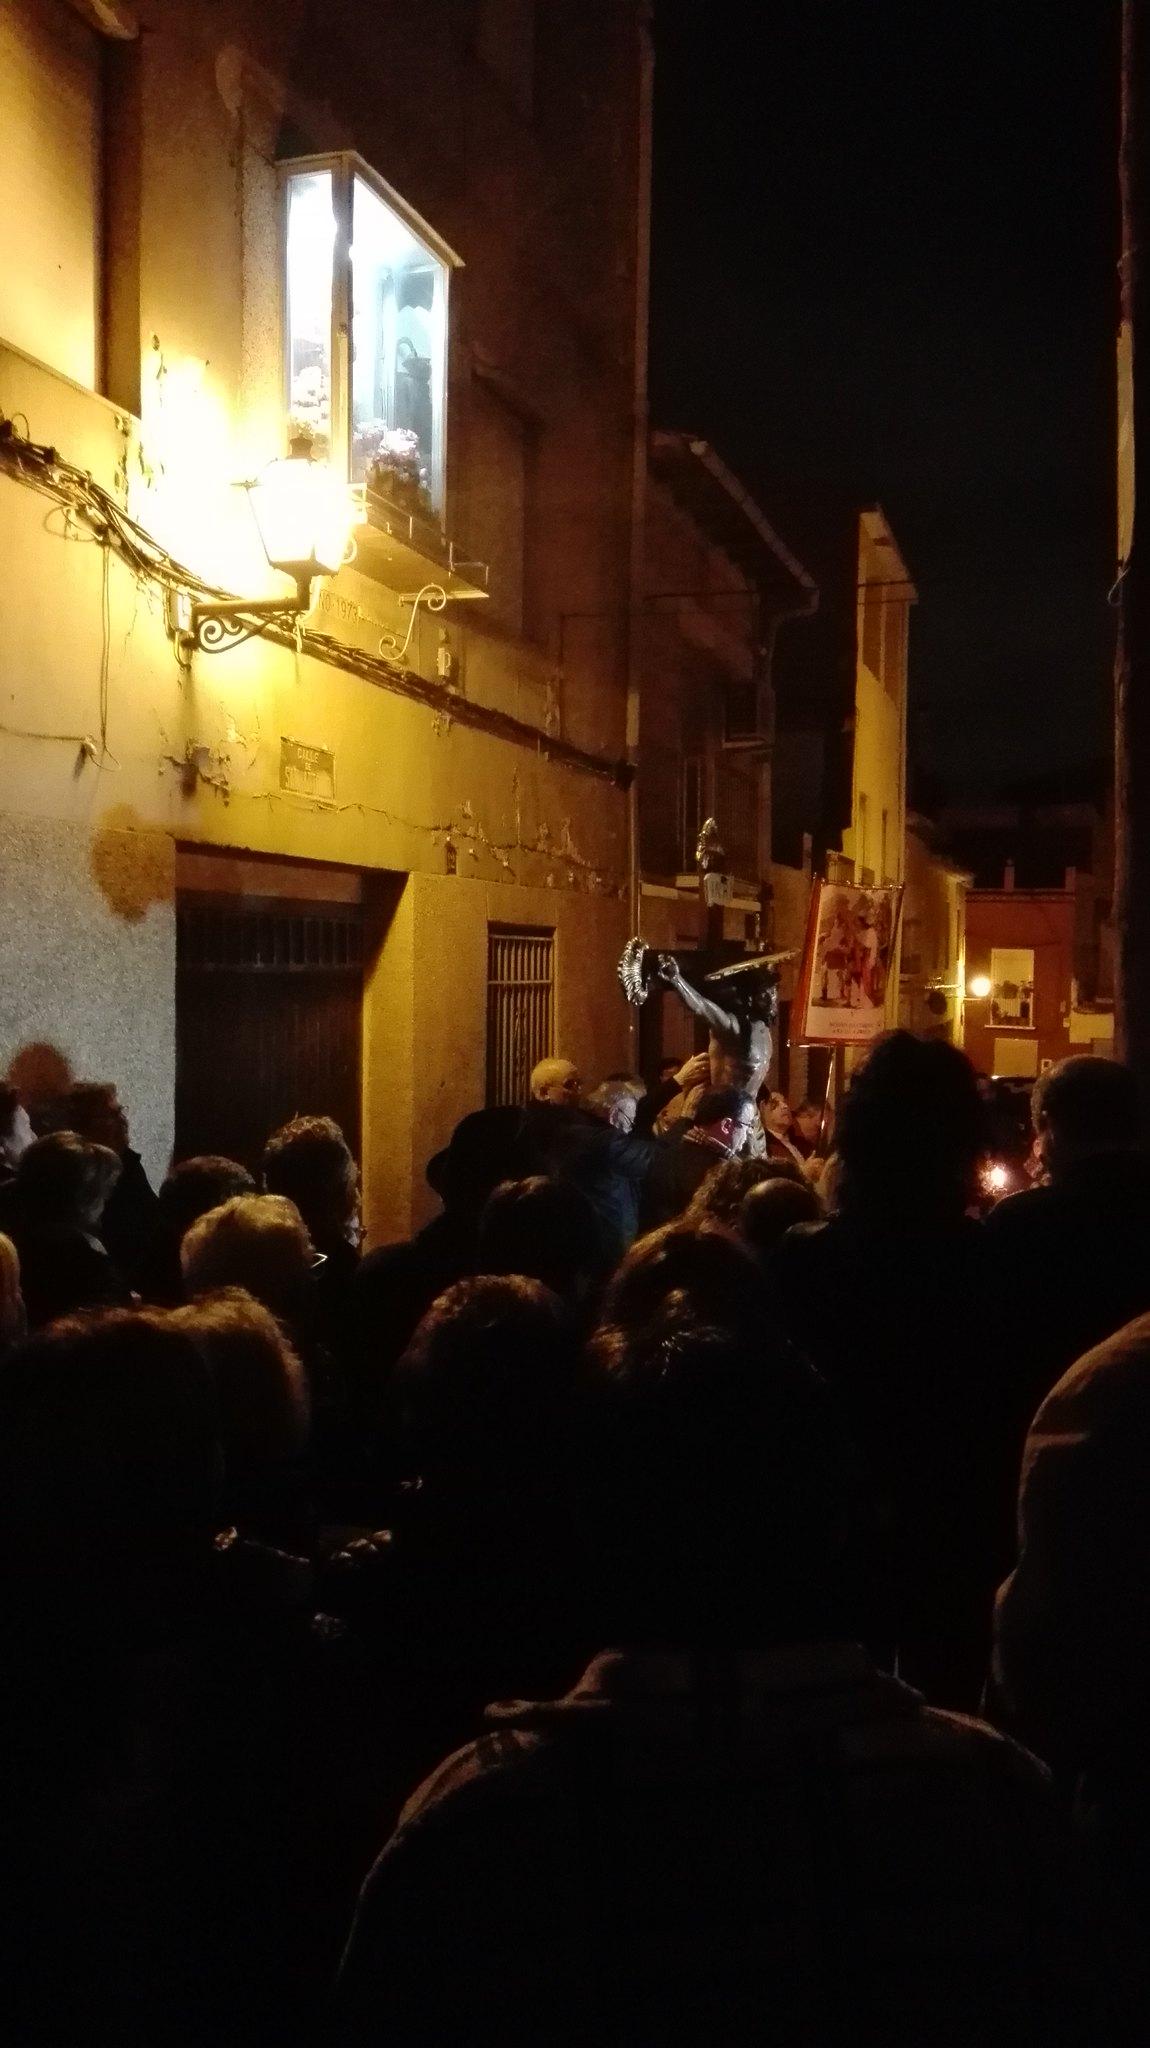 (2016-03-18) - VII Vía Crucis nocturno - Javier Romero Ripoll (008)